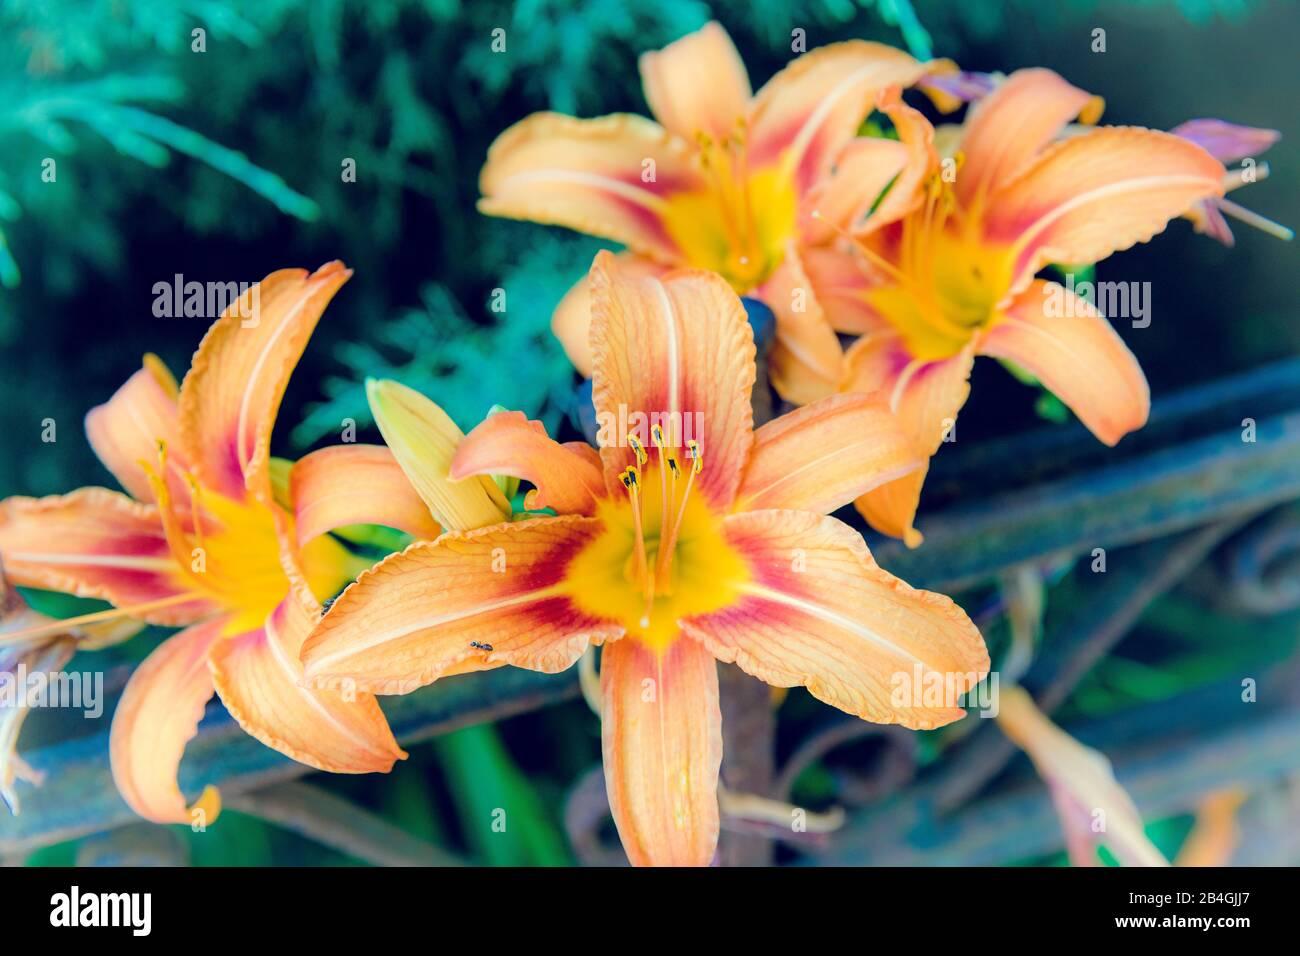 lily, flora, botany, plant, flowers, Wolfenbüttel, Lower Saxony, Germany, Europe Stock Photo